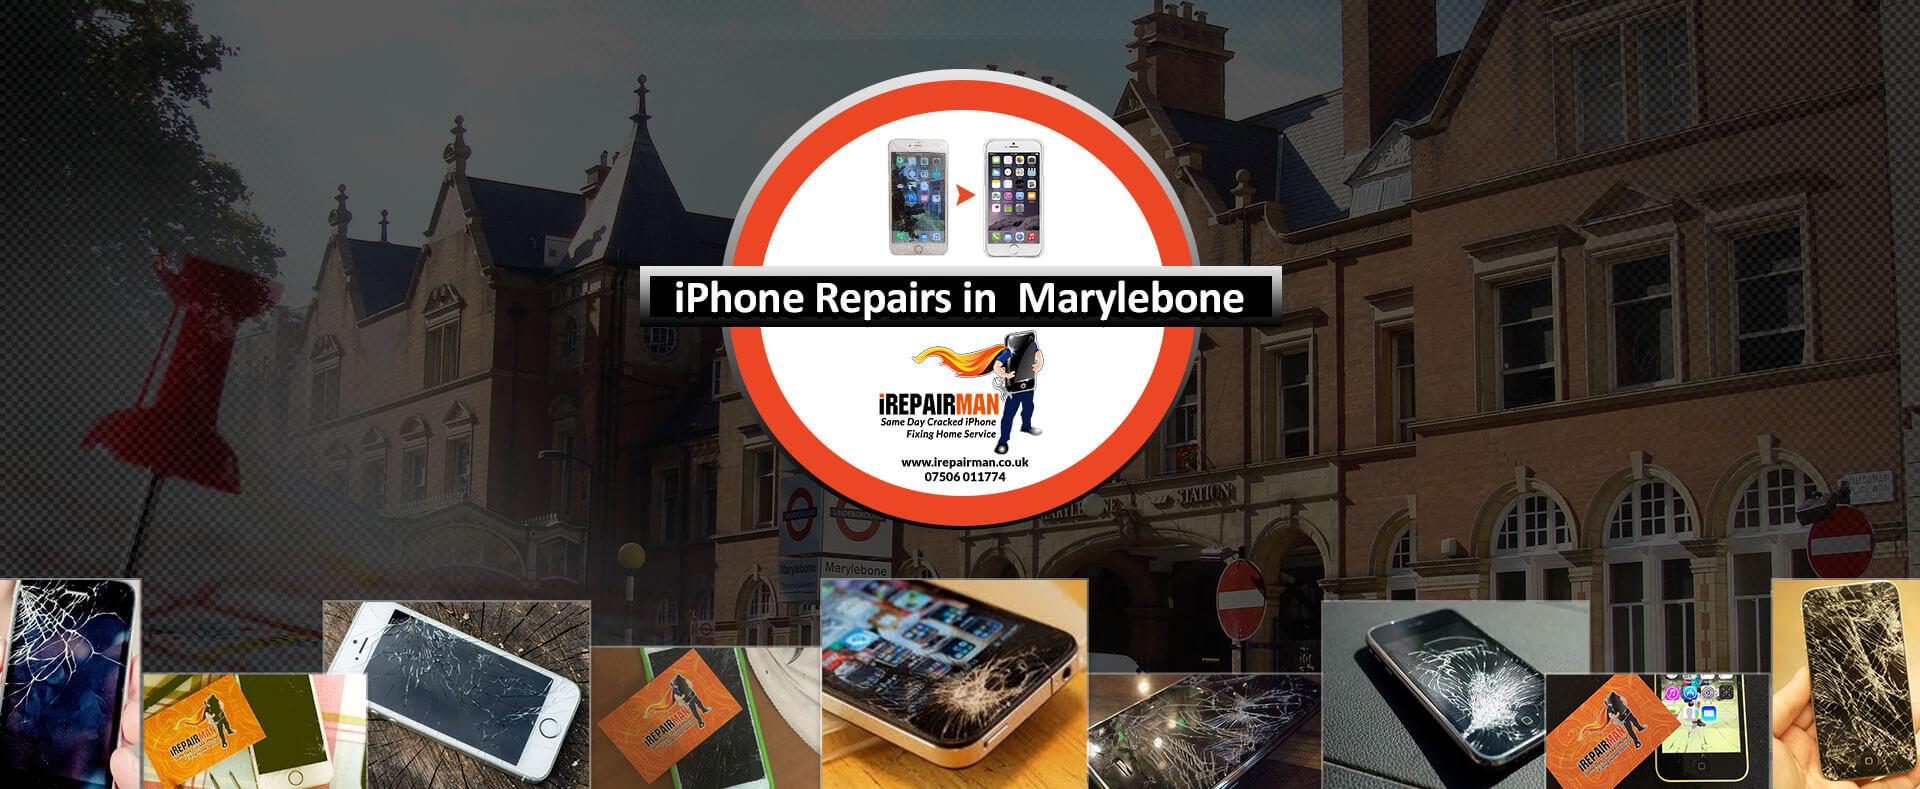 iphone-repairs-in-marylebone